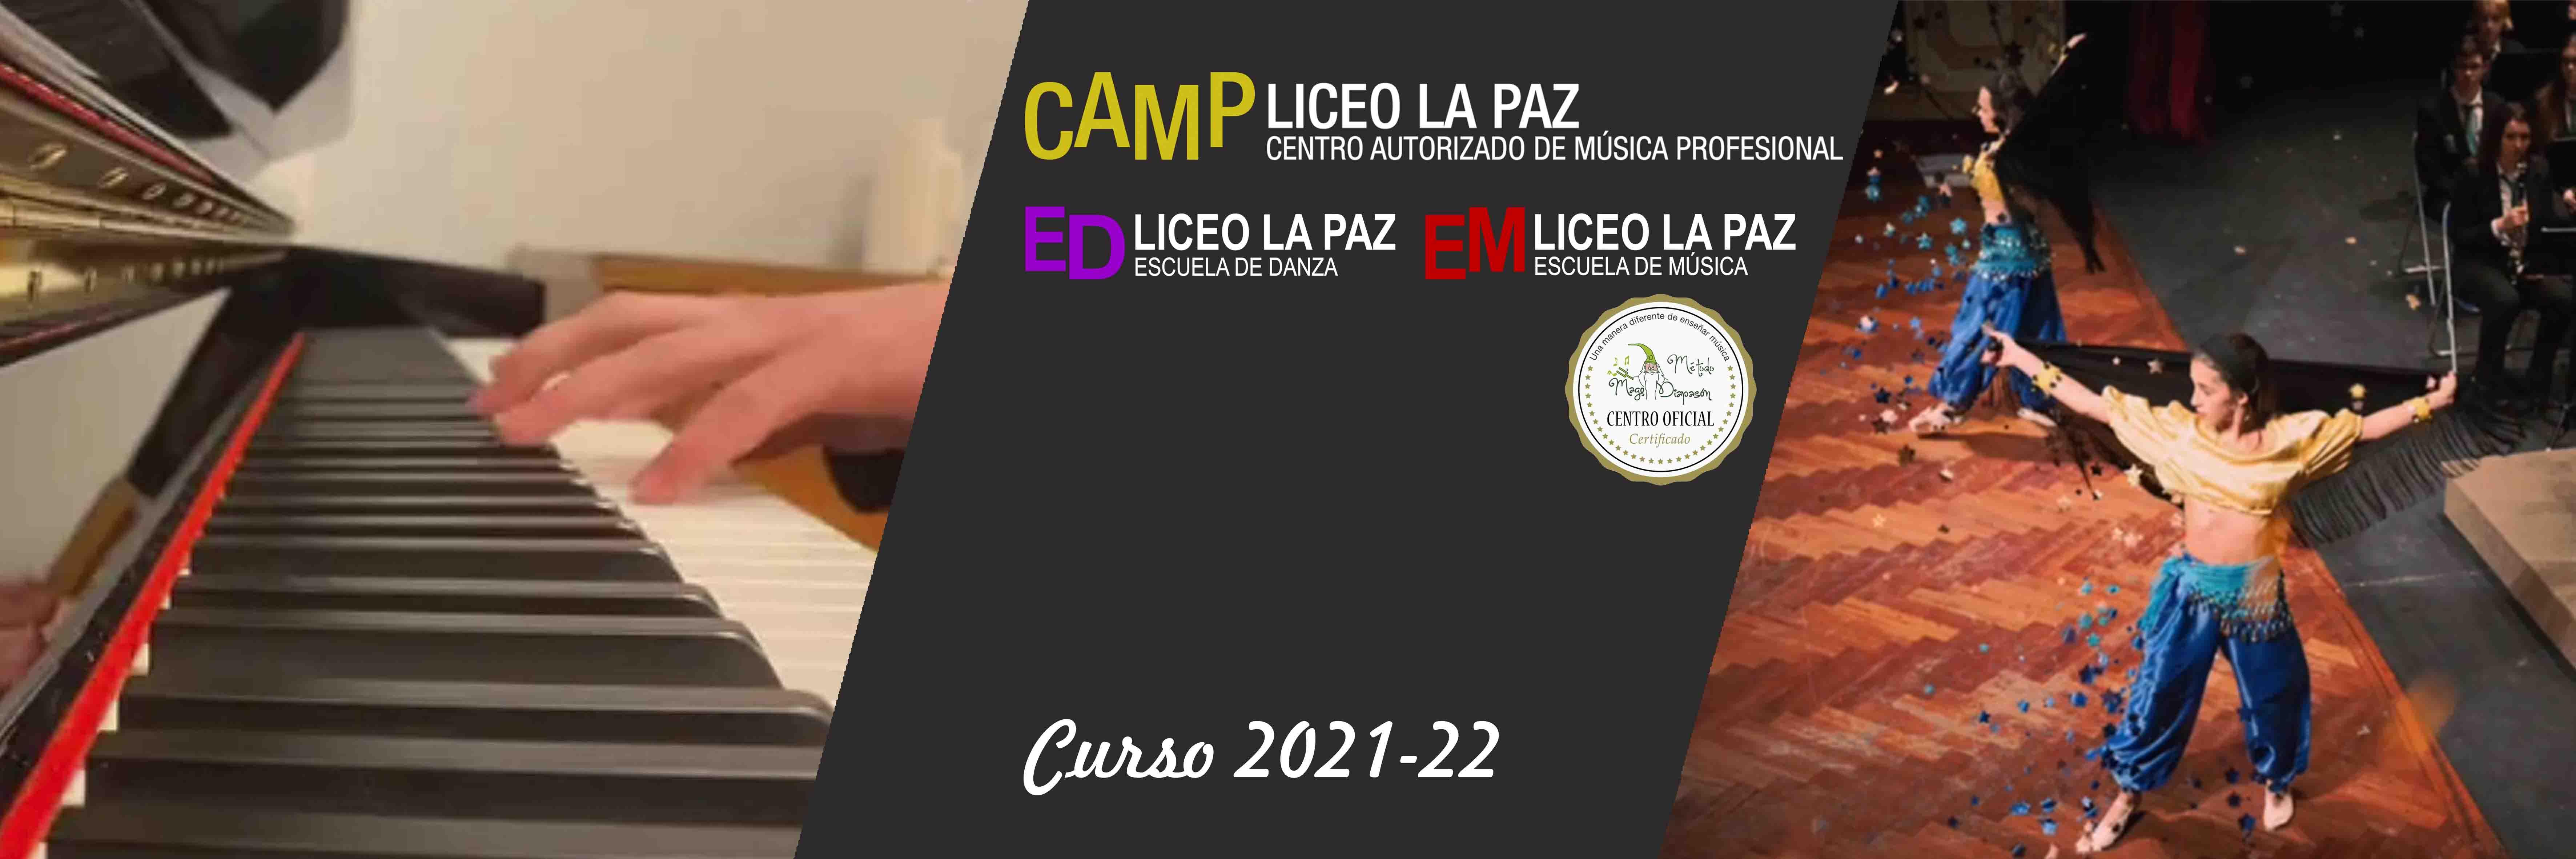 slide-CAMP-matricula-2